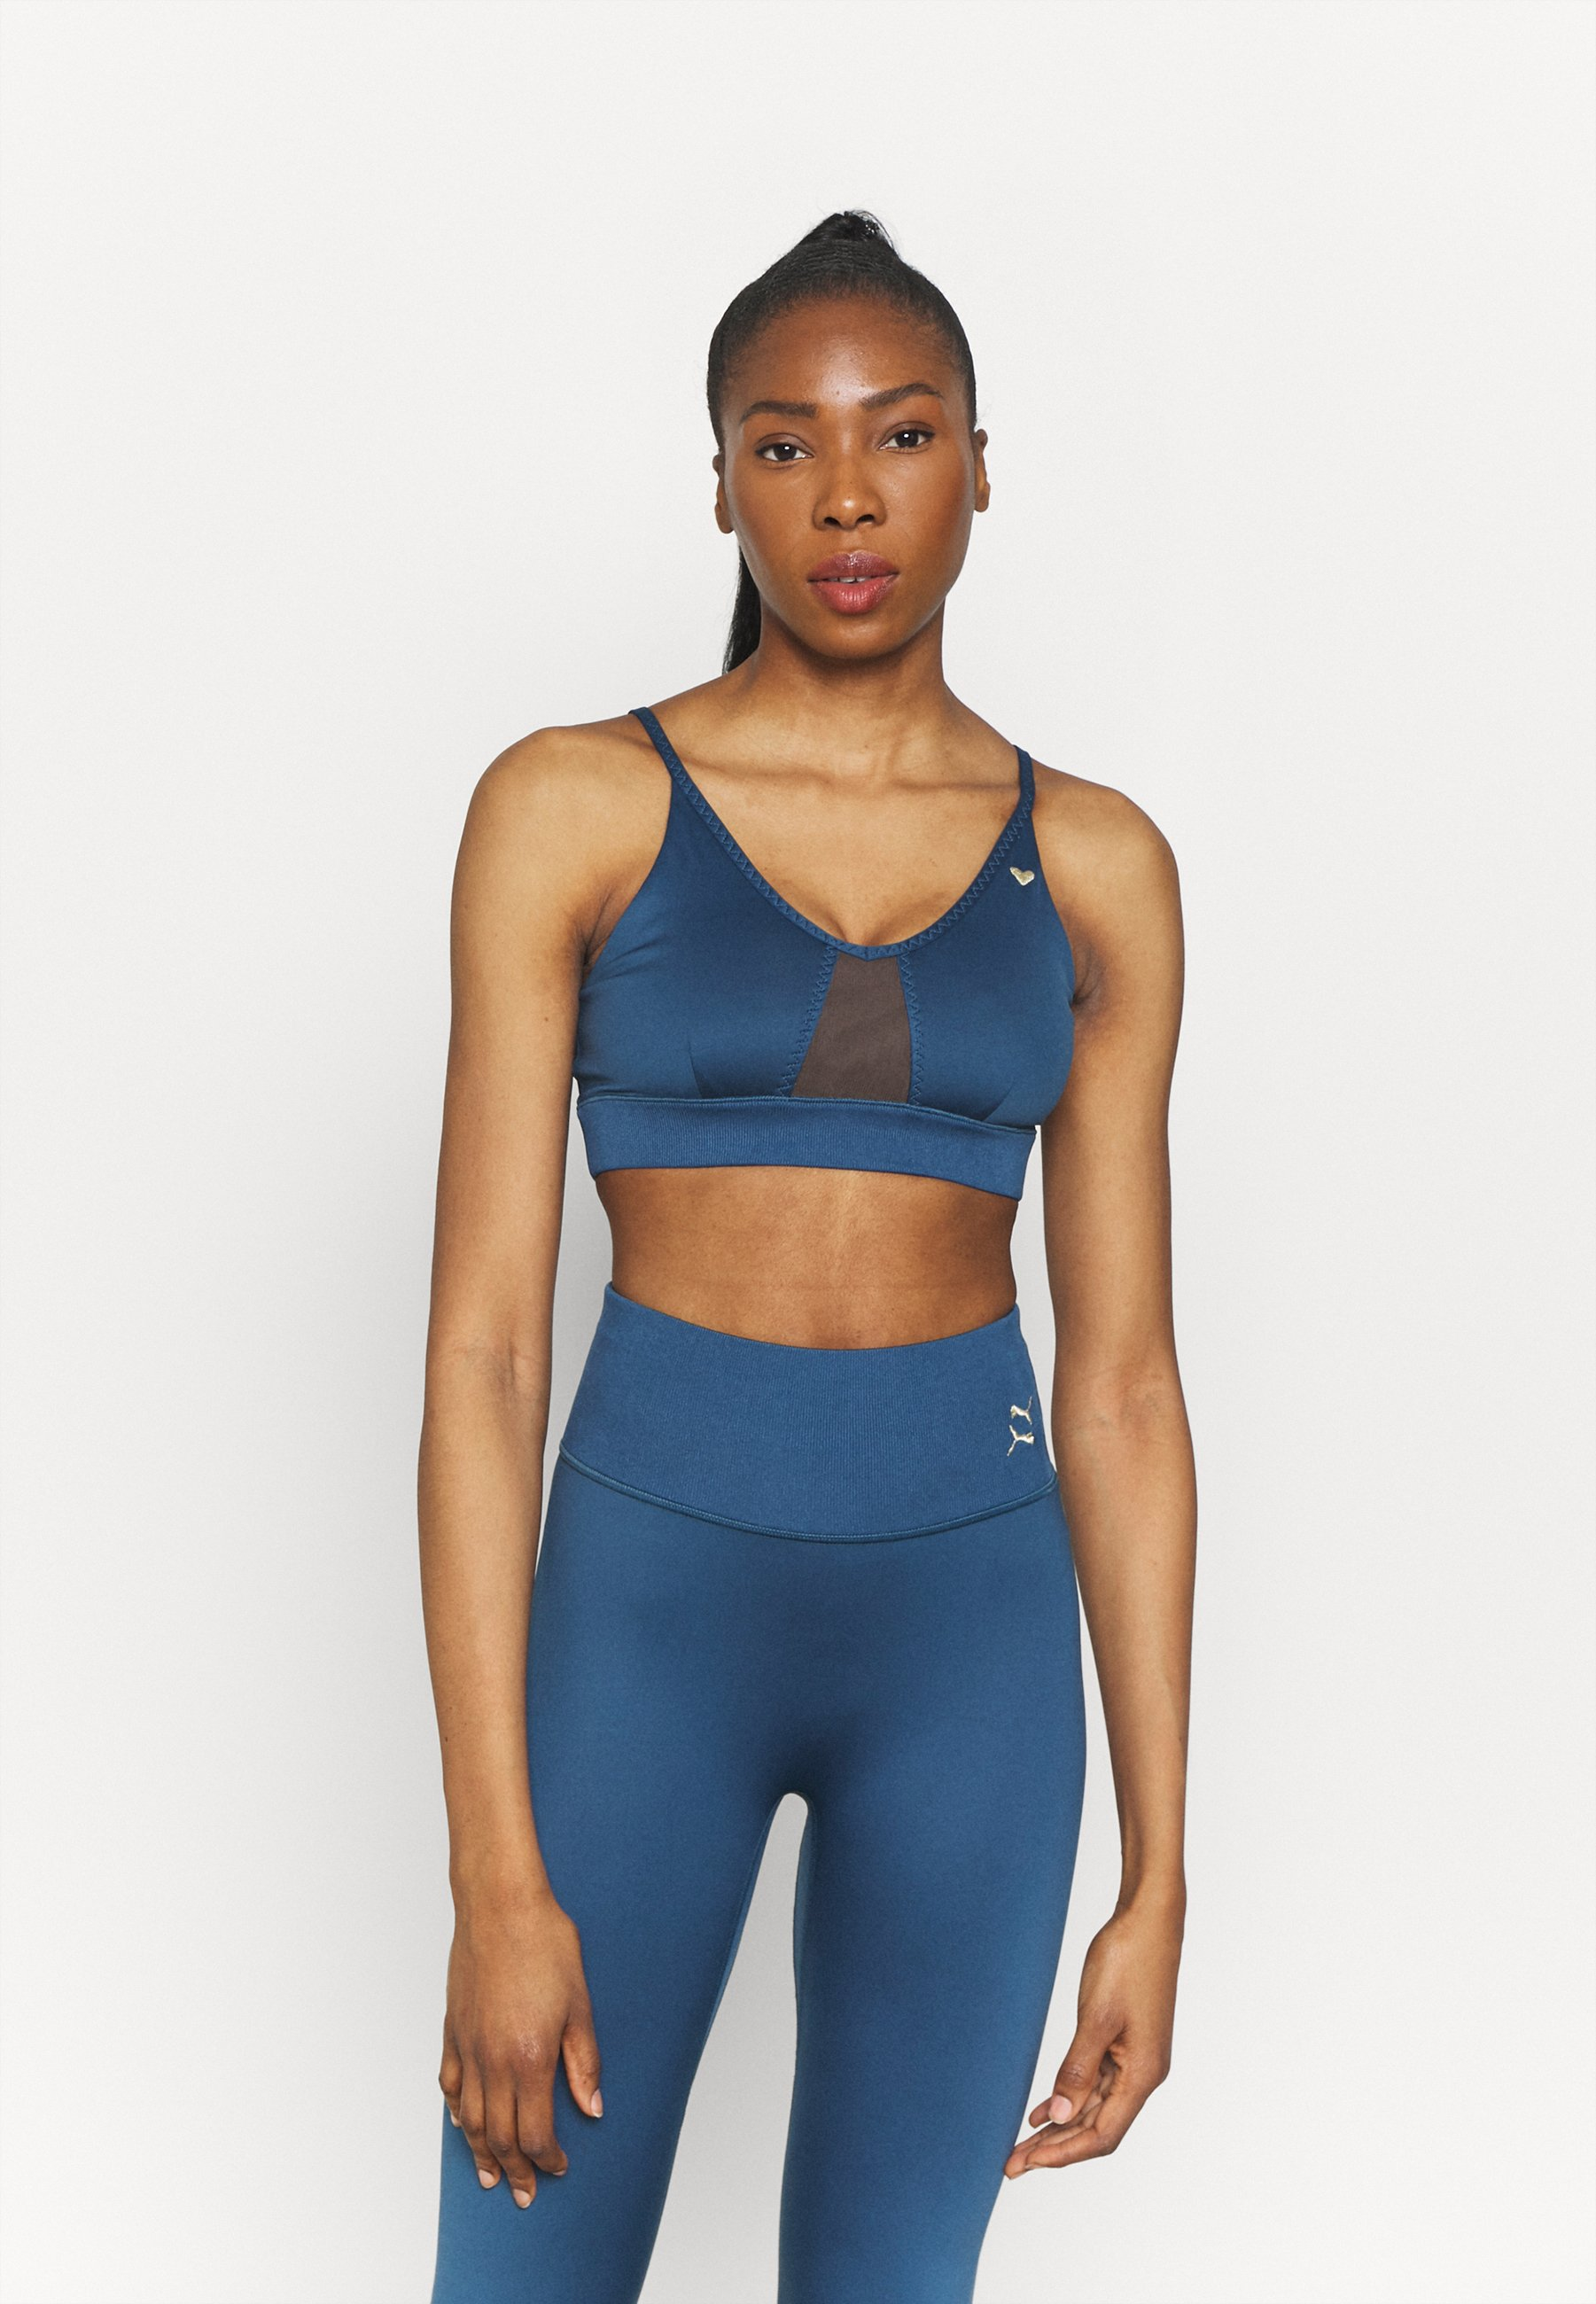 Women EXHALE STUDIO BRA - Light support sports bra